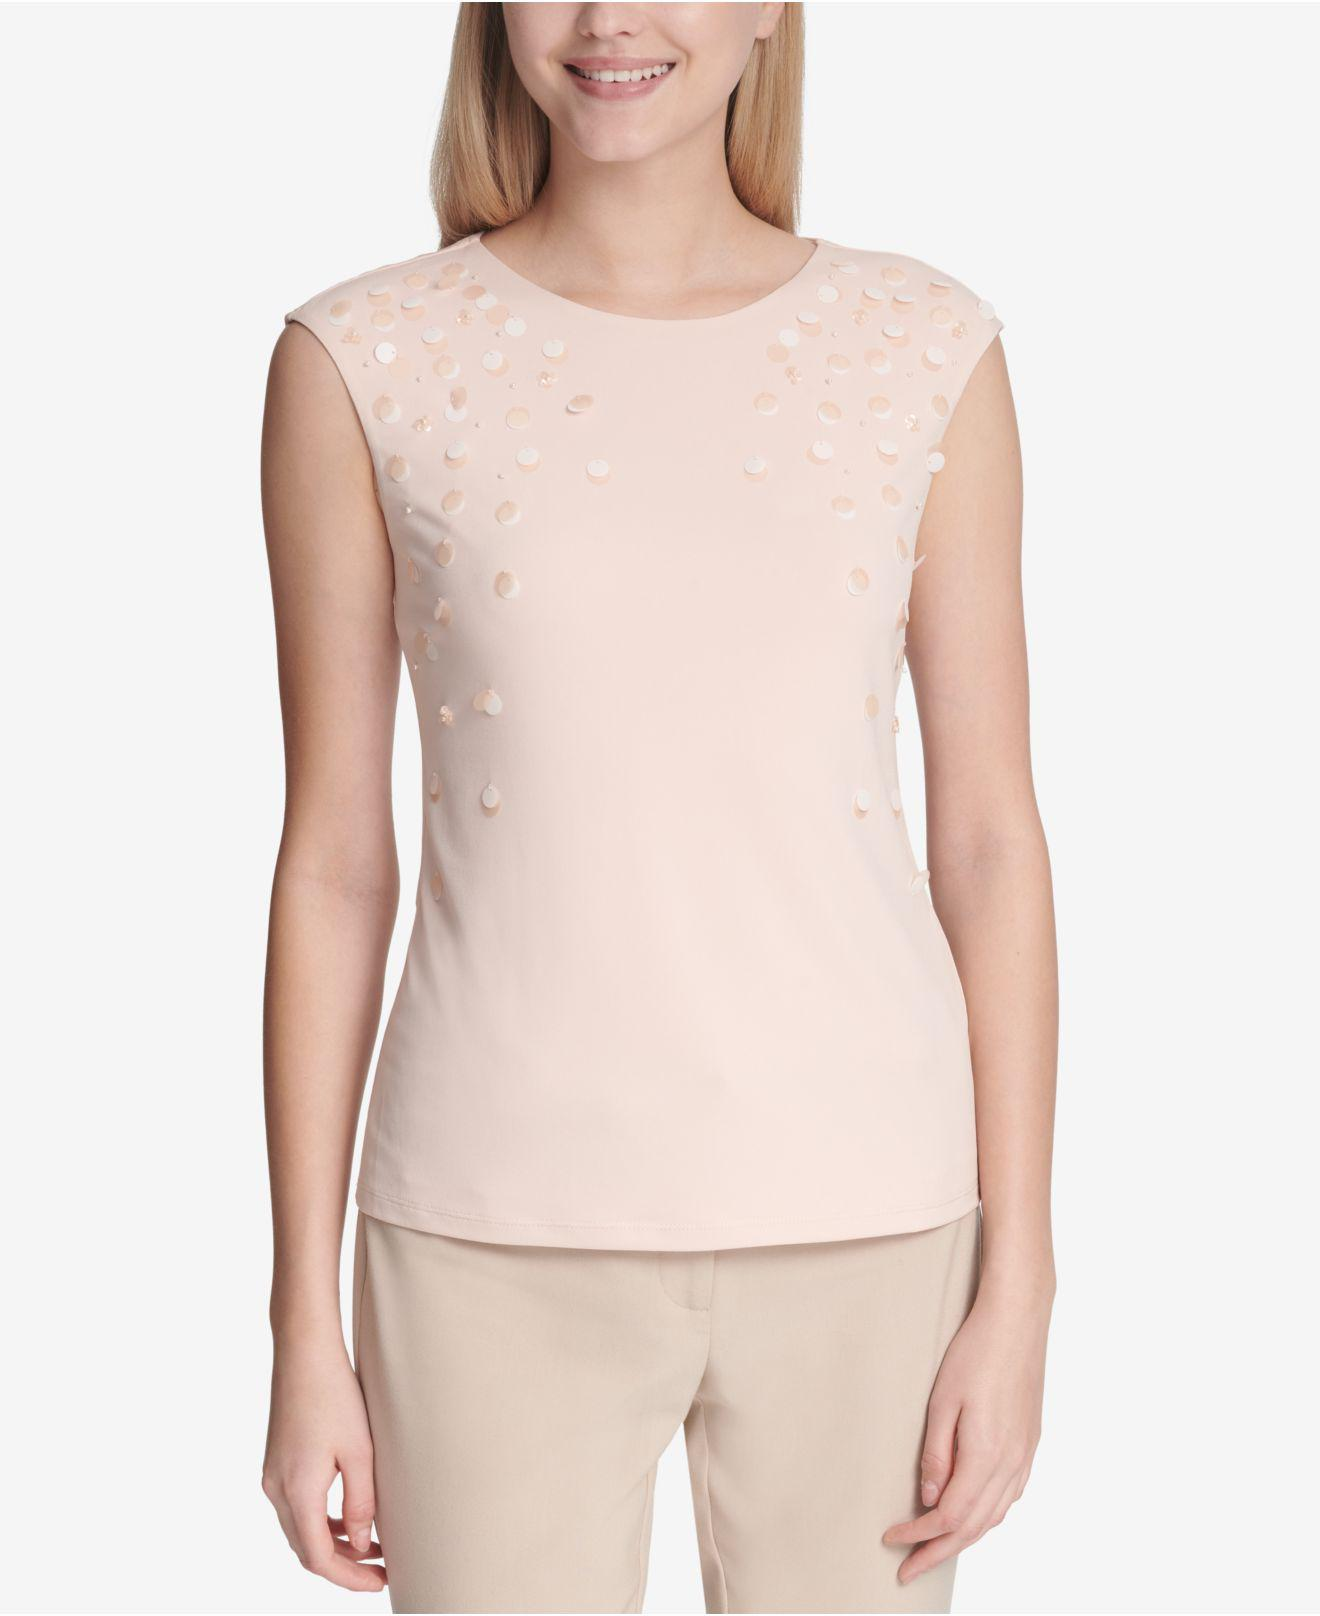 8ec347bfd642c Lyst - Calvin Klein Embellished Crew-neck Top in Pink